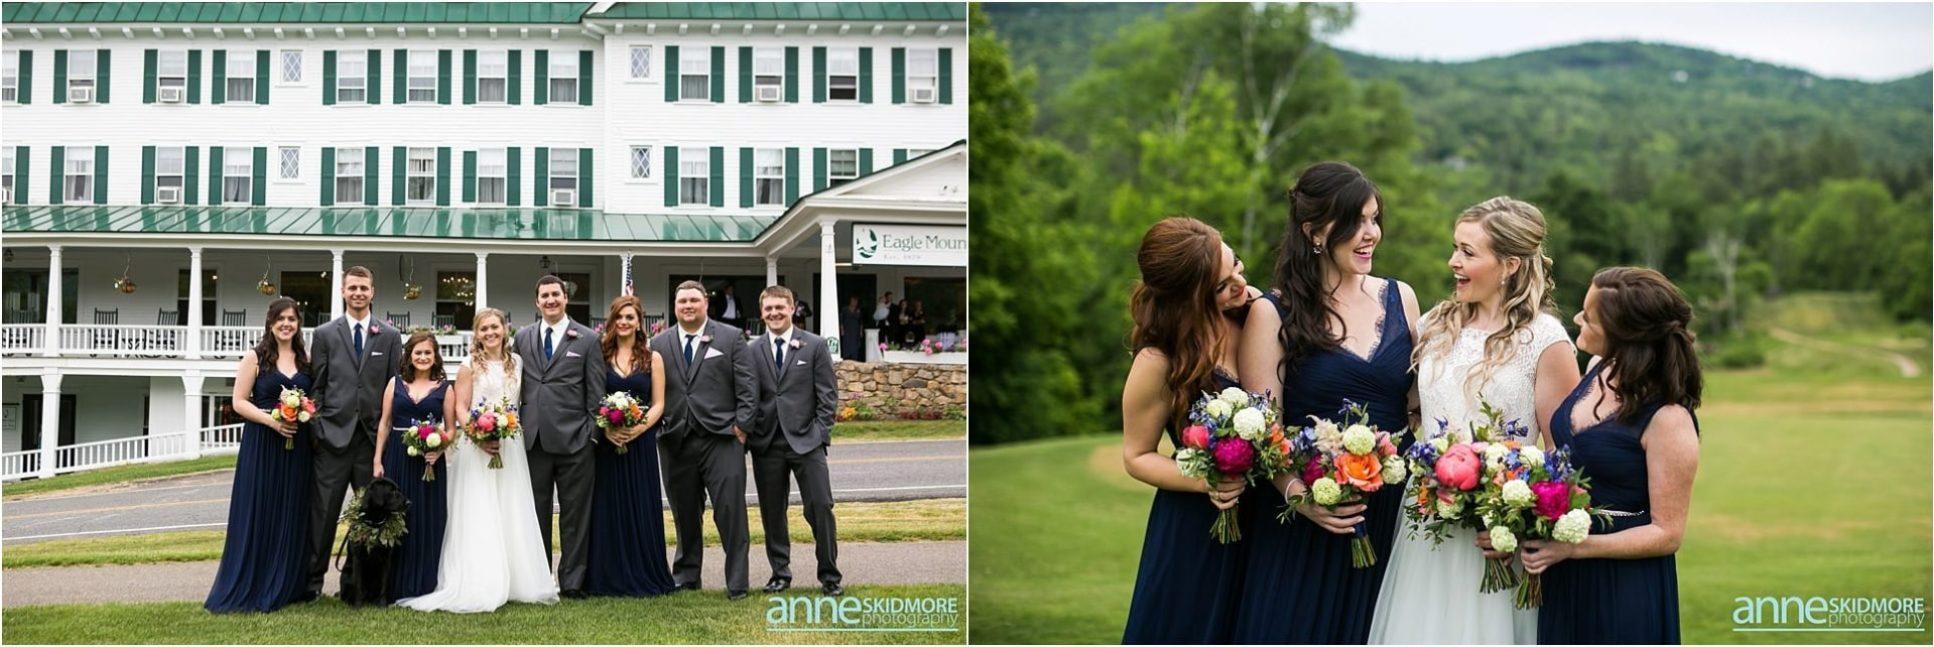 Eagle_Mountain_House_Wedding__032